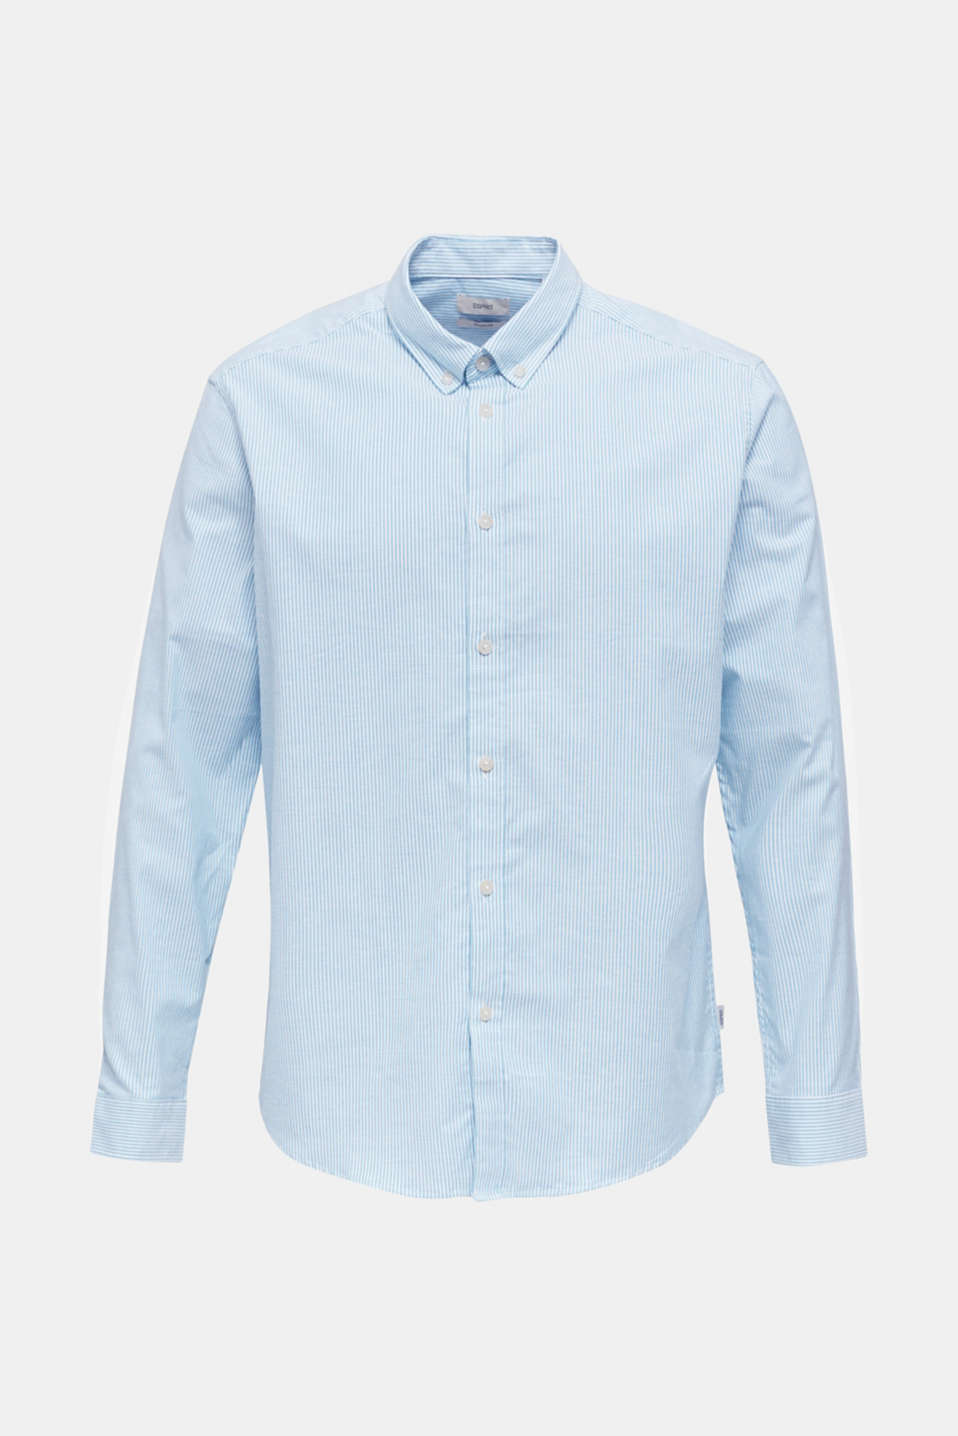 Shirts woven Regular fit, DARK TURQUOISE 3, detail image number 5